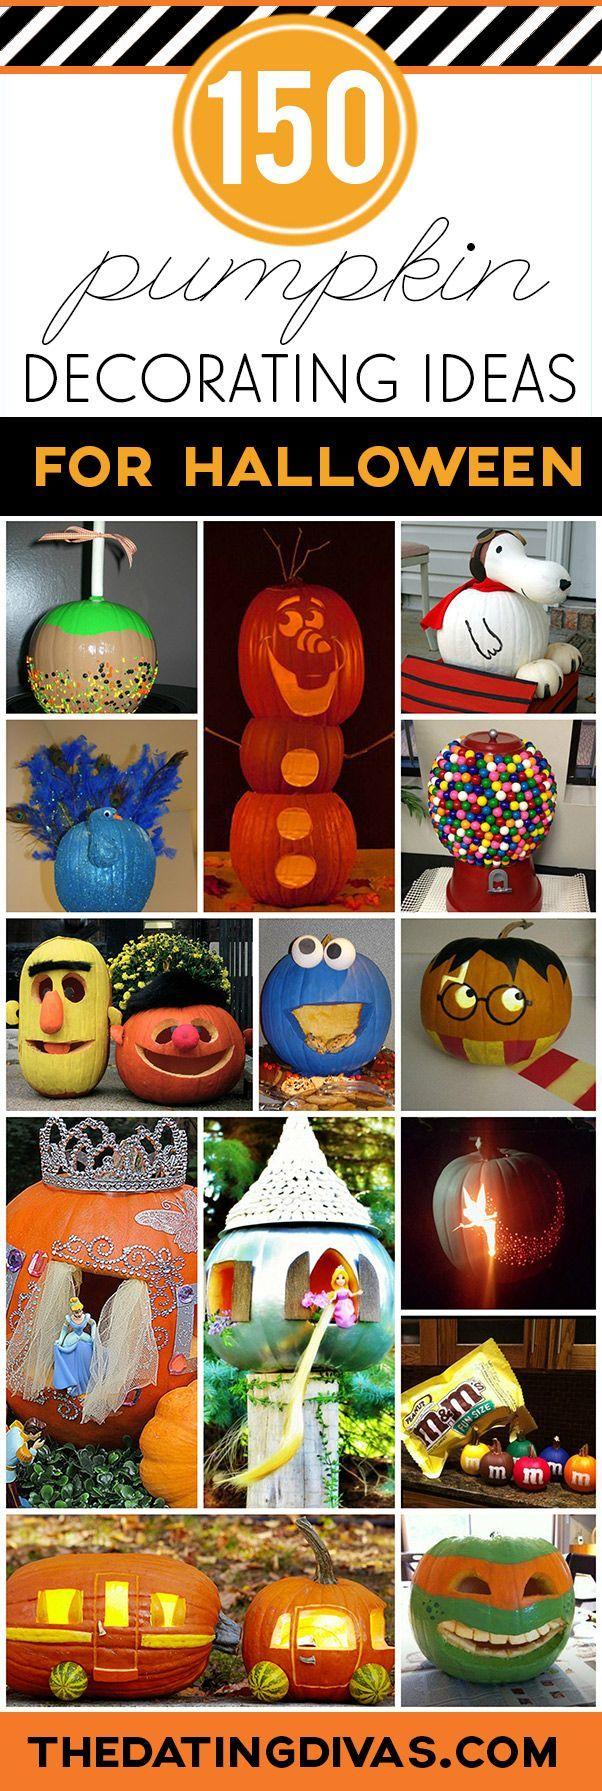 And fashion magic halloween pumpkins carving and decorating ideas - 150 Pumpkin Decorating Ideas